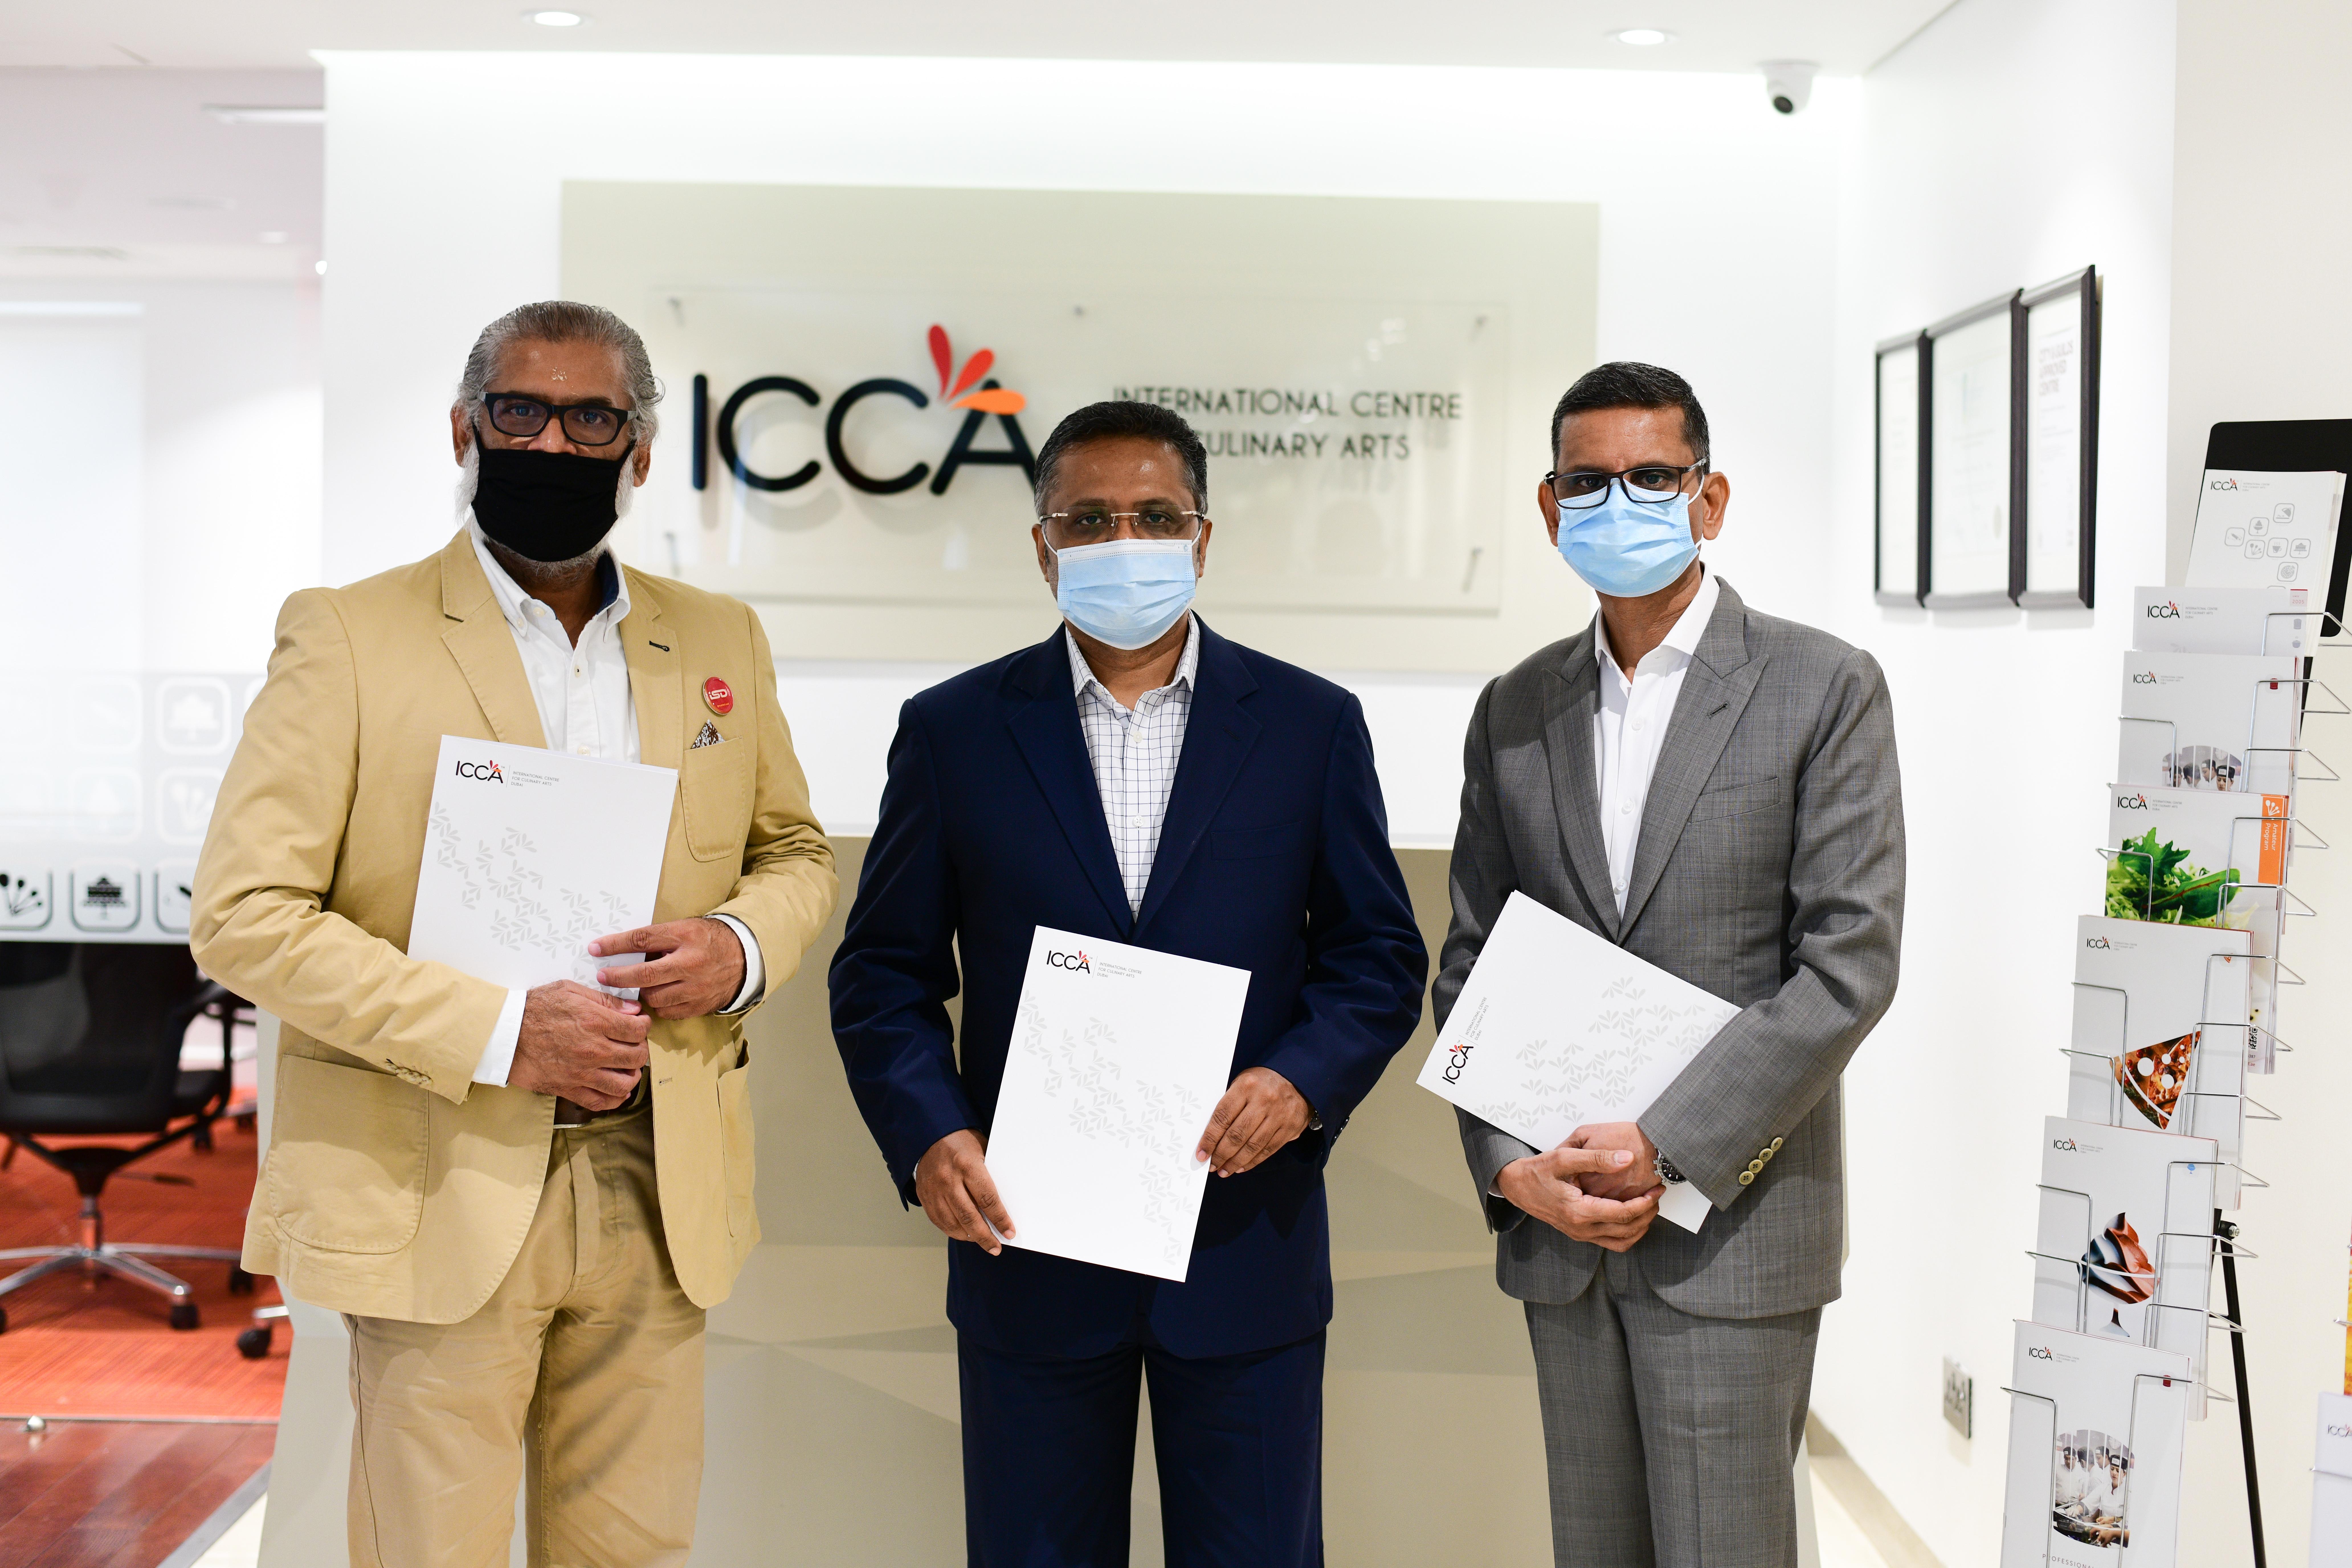 Kioxia ICCA Contractsigning picture 1